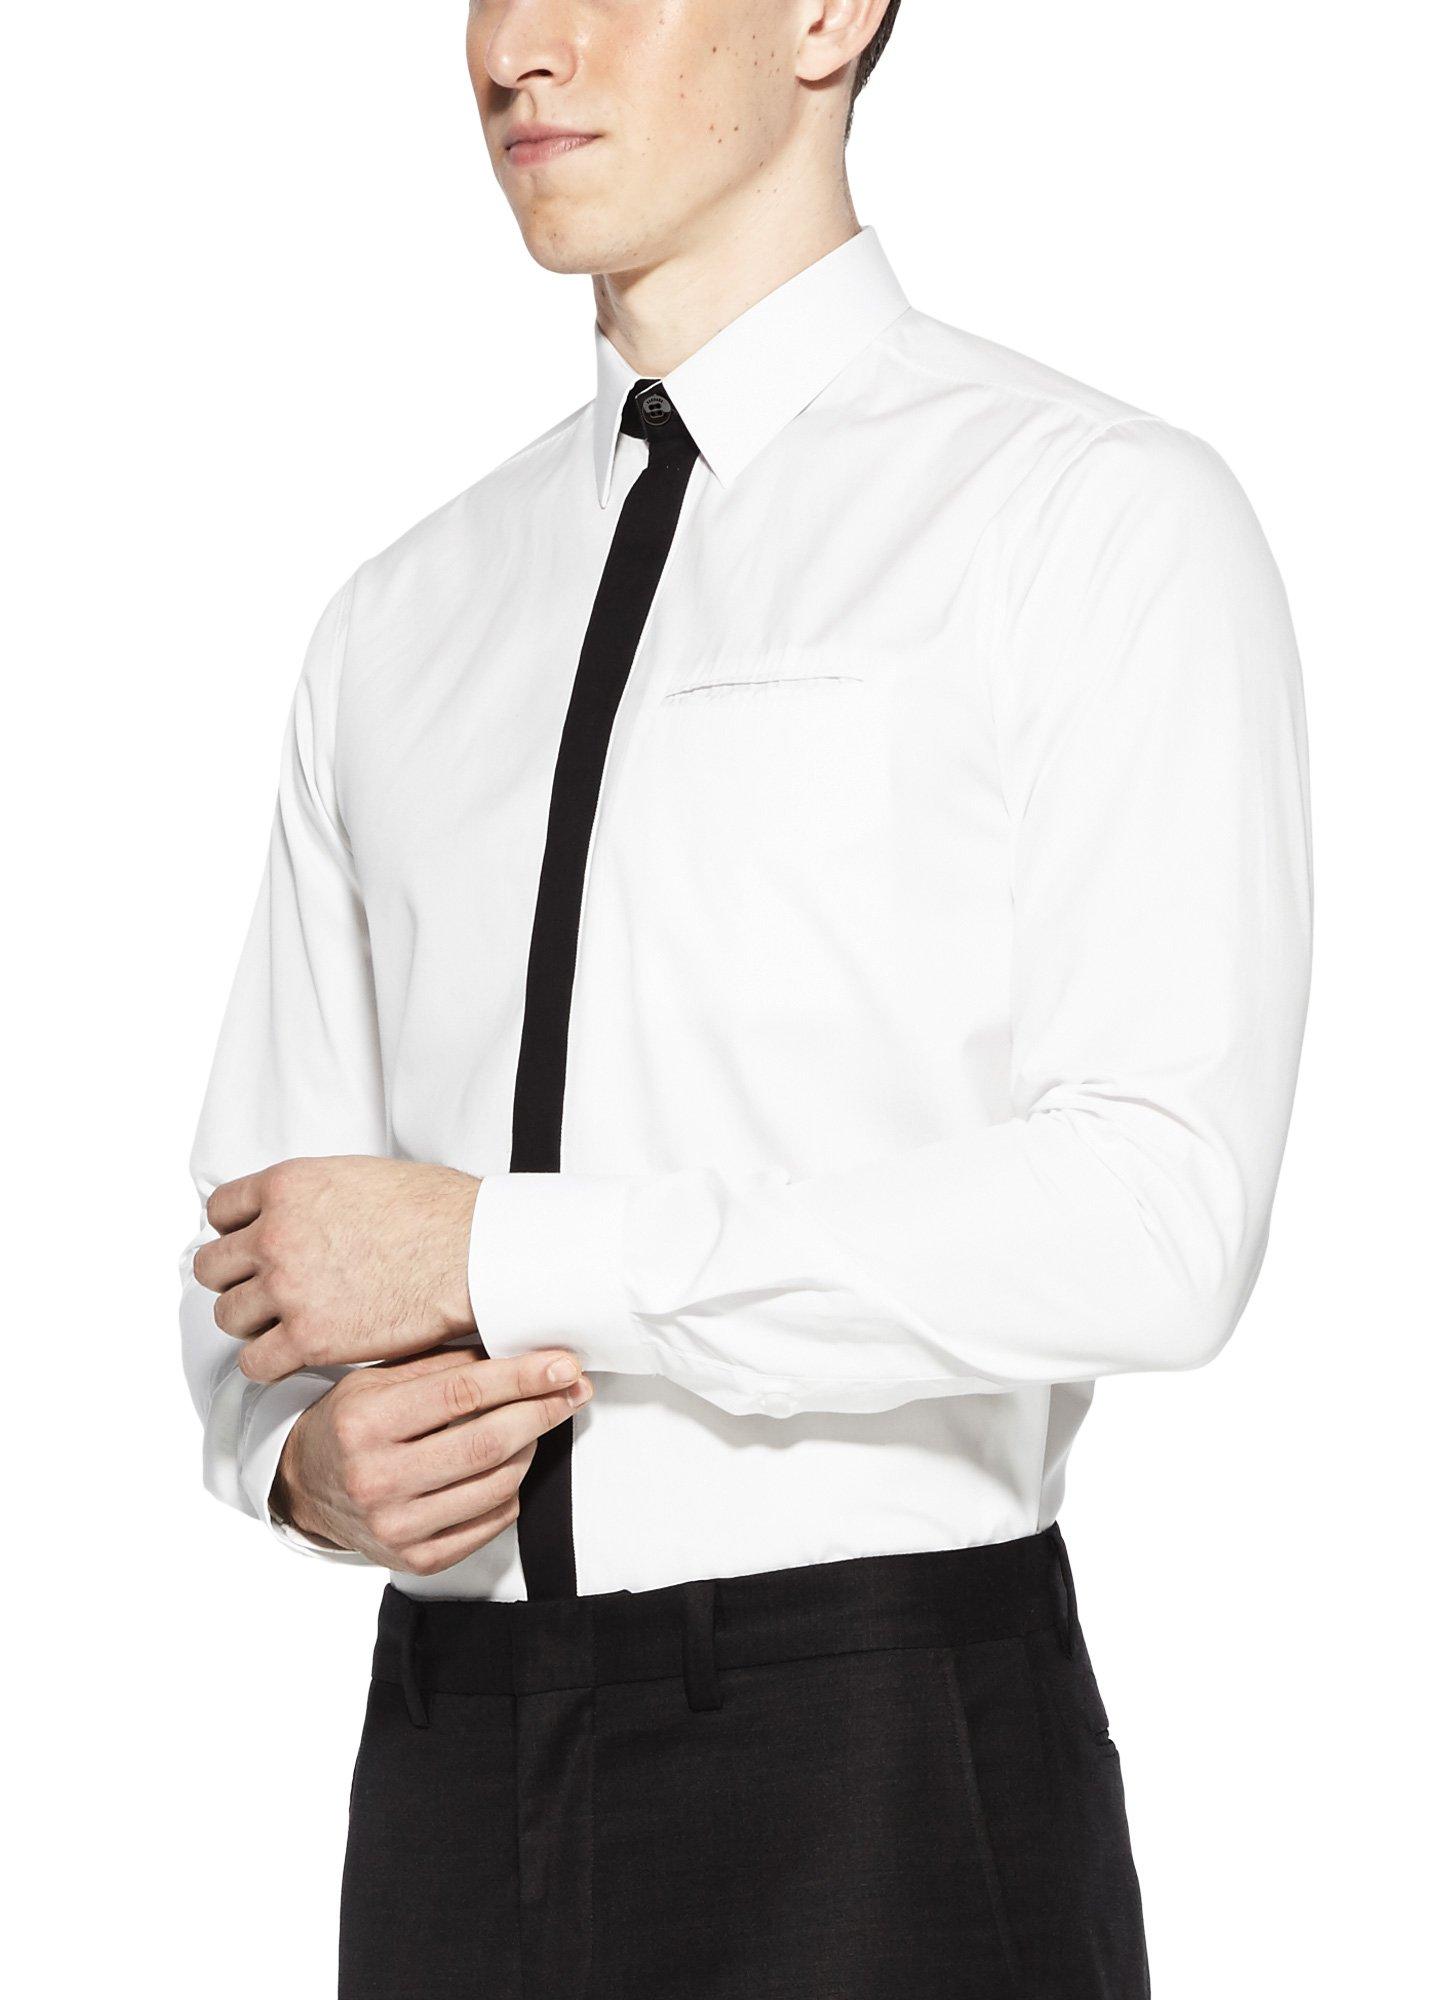 Vardama Men's Performance White Dress Shirt With Contrast Placket Welt Pocket Bond St